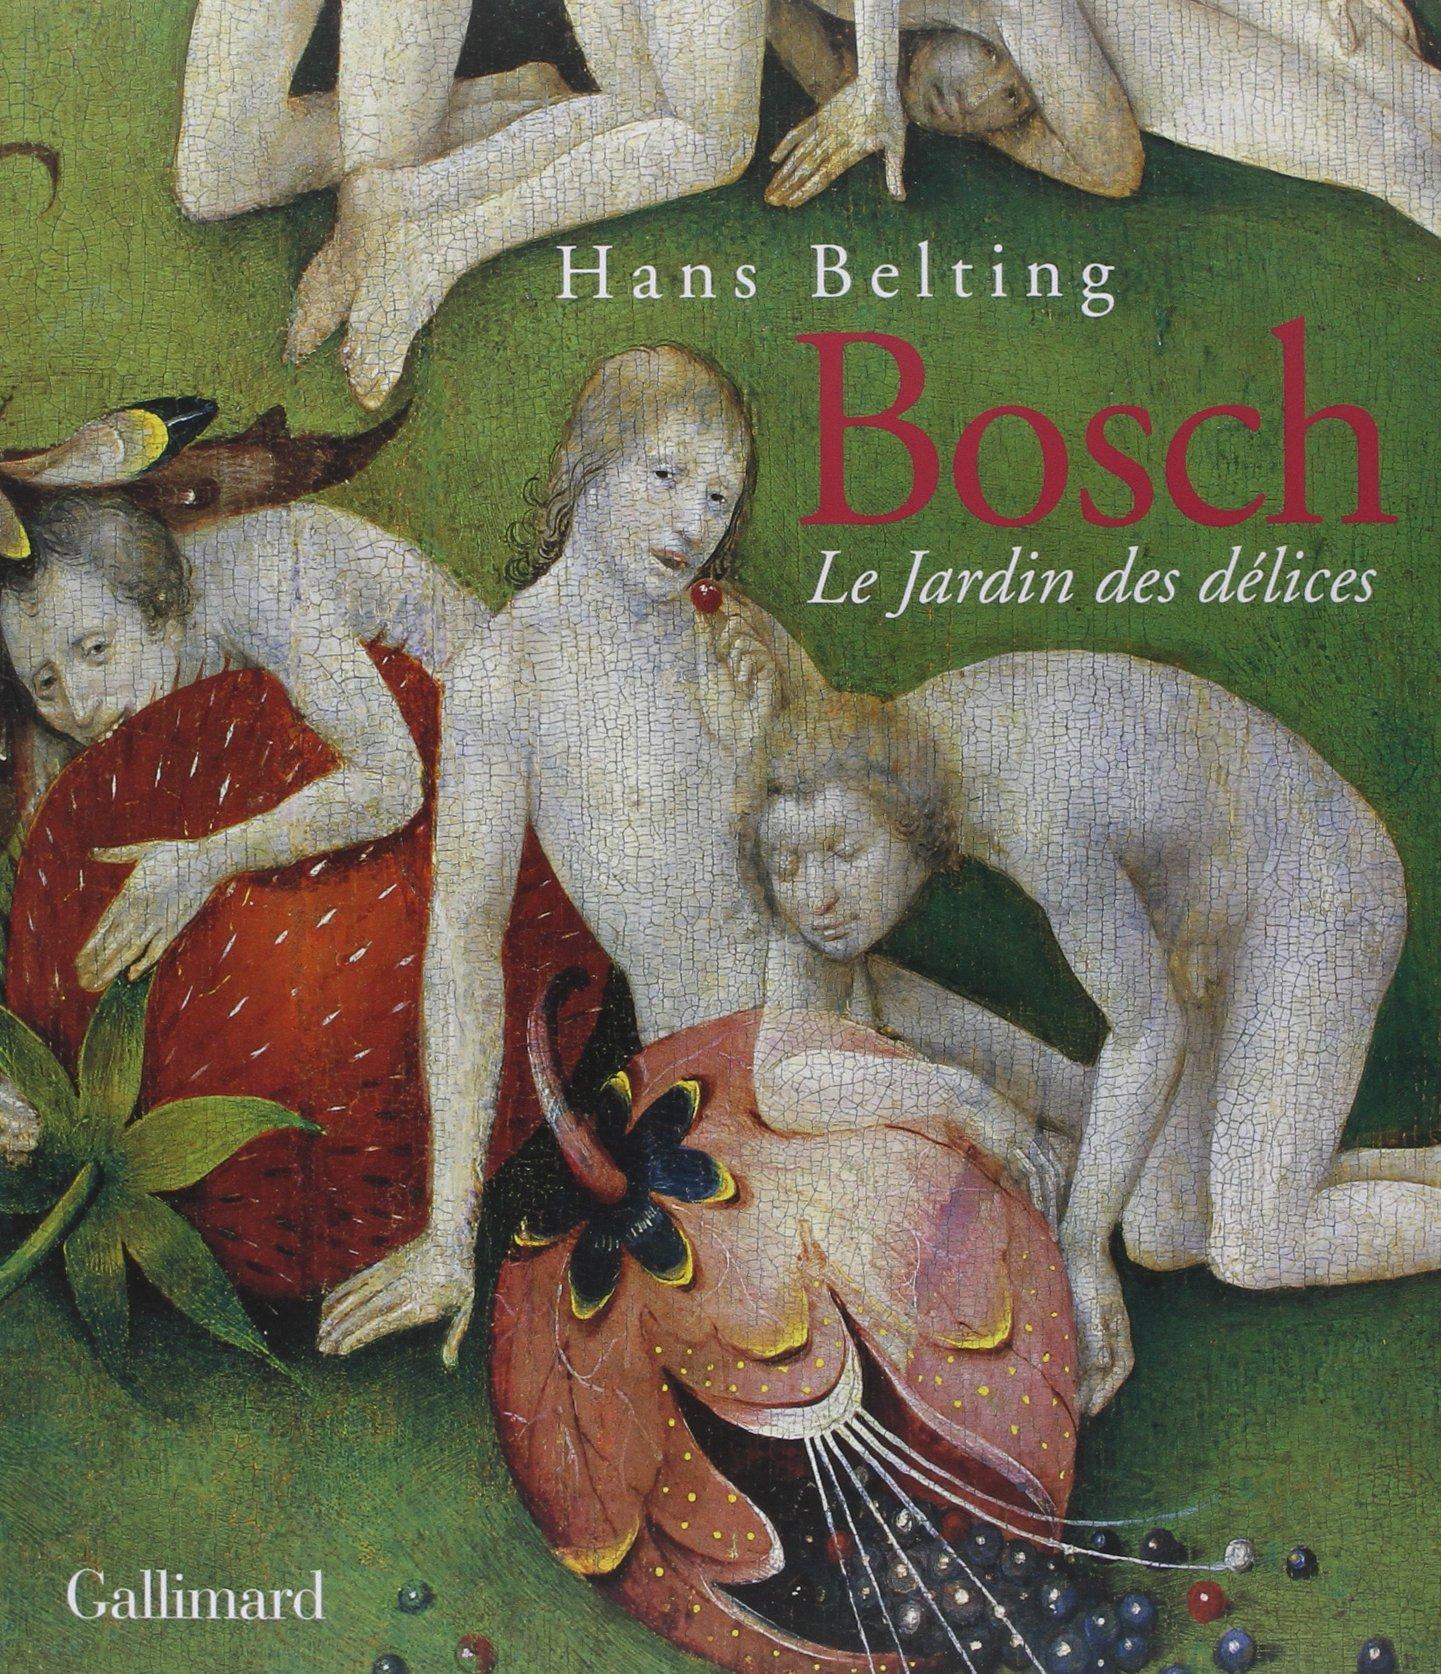 Amazon Hieronymus Bosch Le Jardin des délices Hans Belting